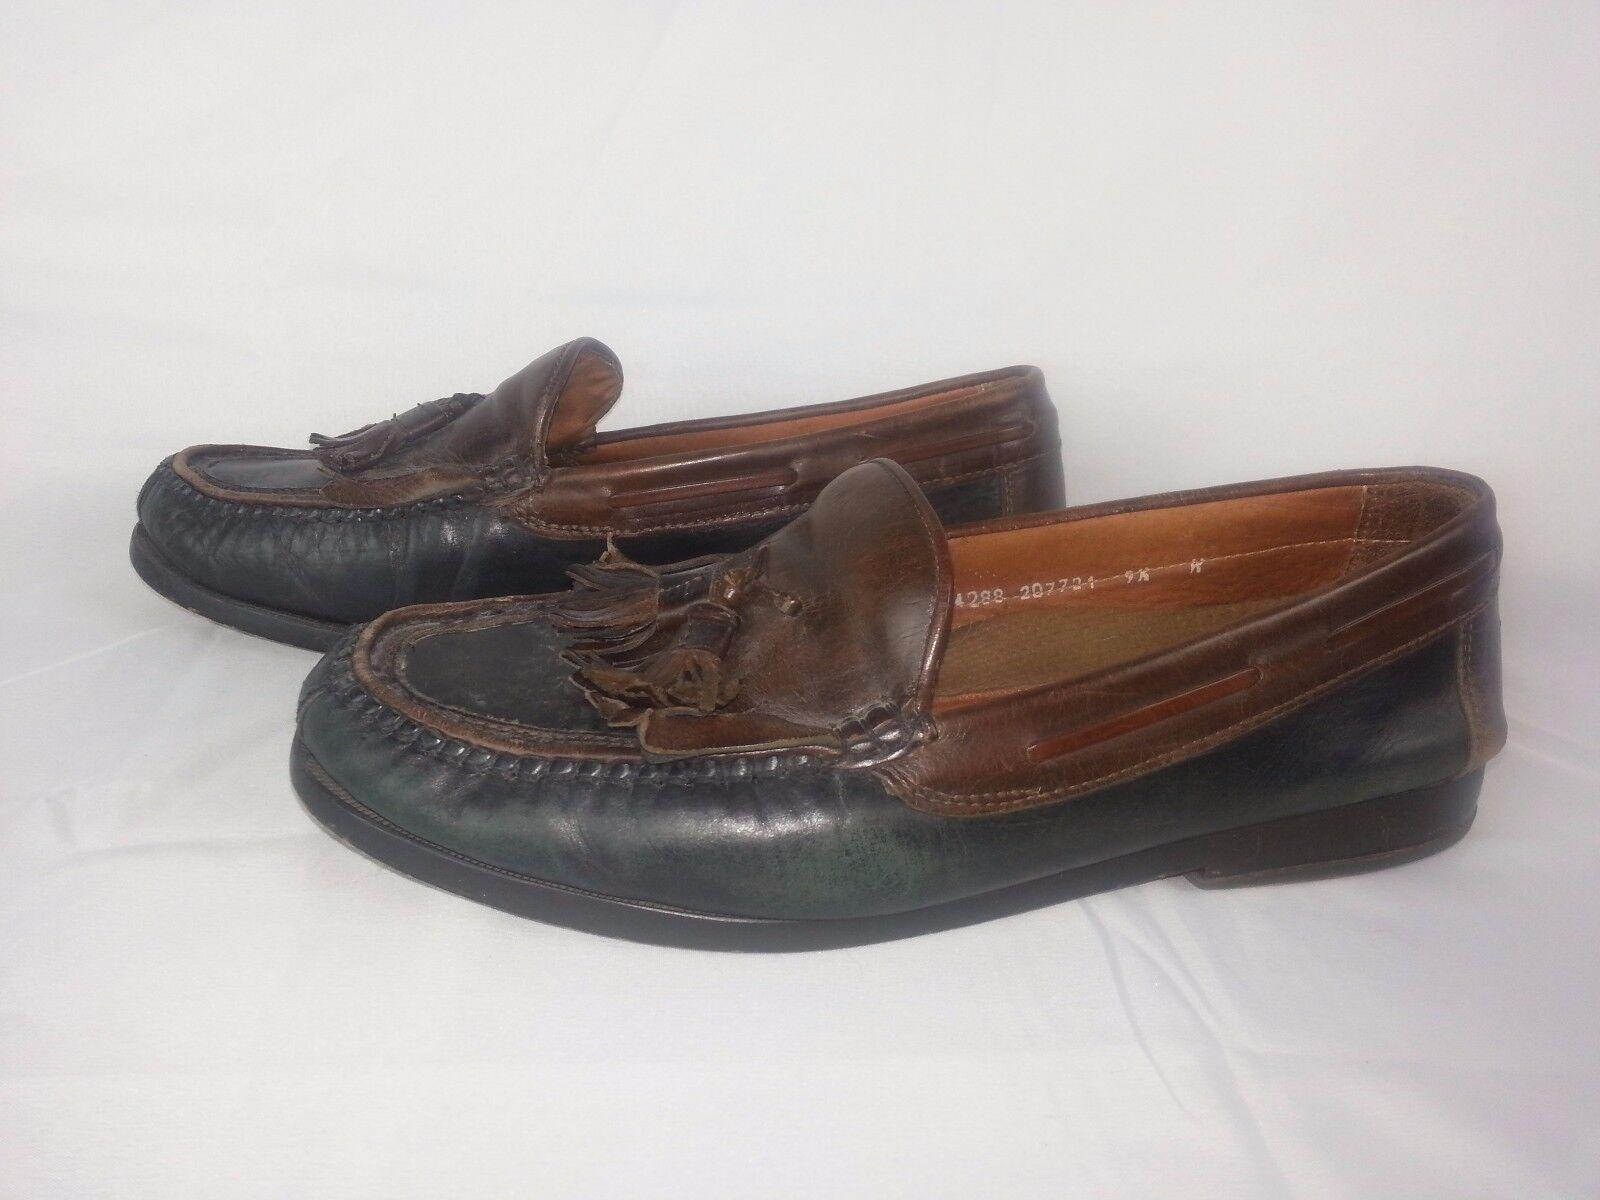 Johnston Murphy Men's shoes Sz 9 Two-tone Brown Leather Slip On Tassels